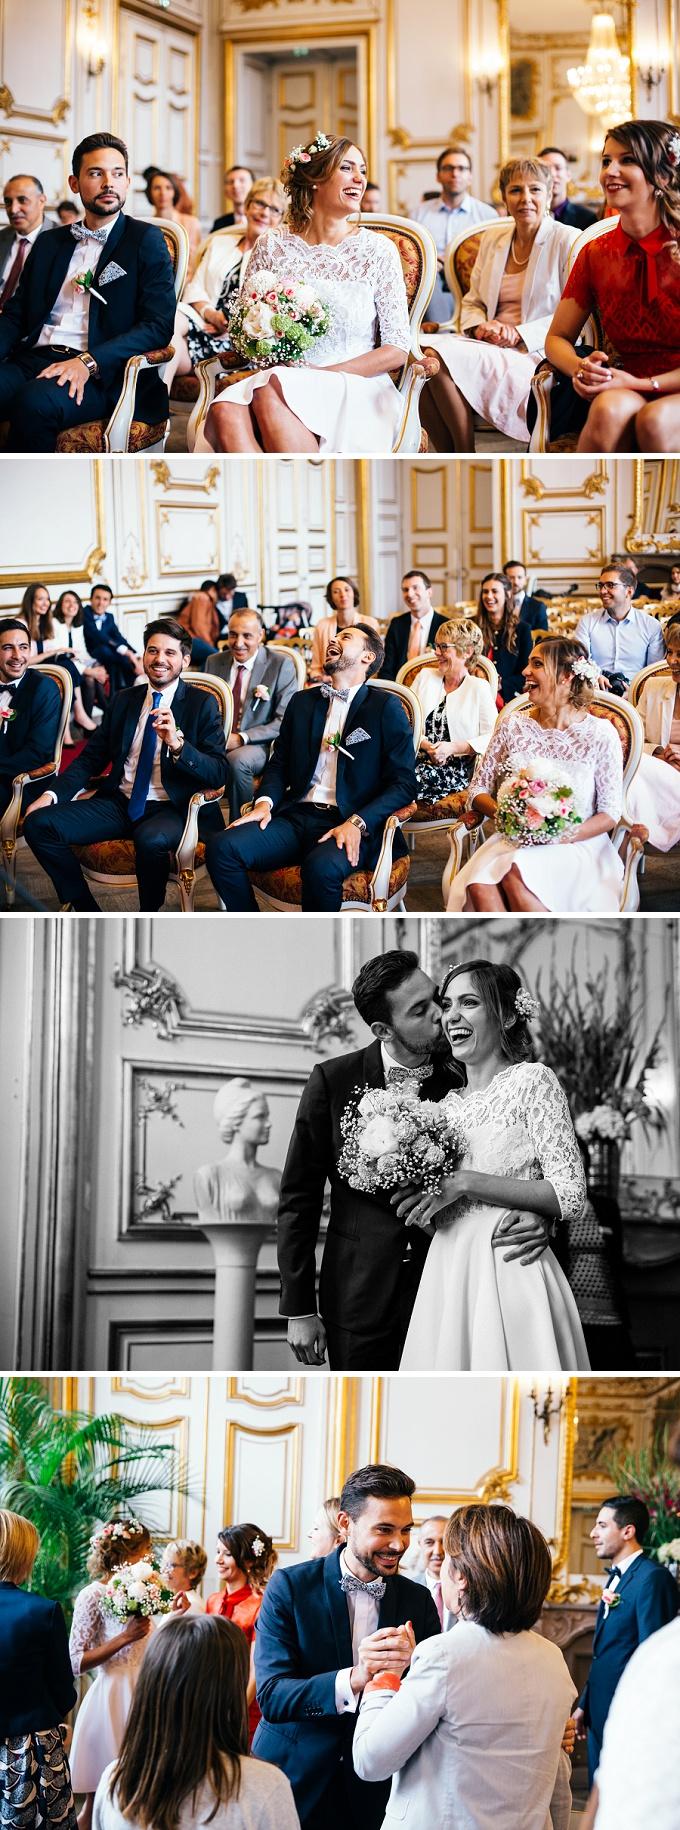 mariage-chateau-dosthoffen-007.jpg